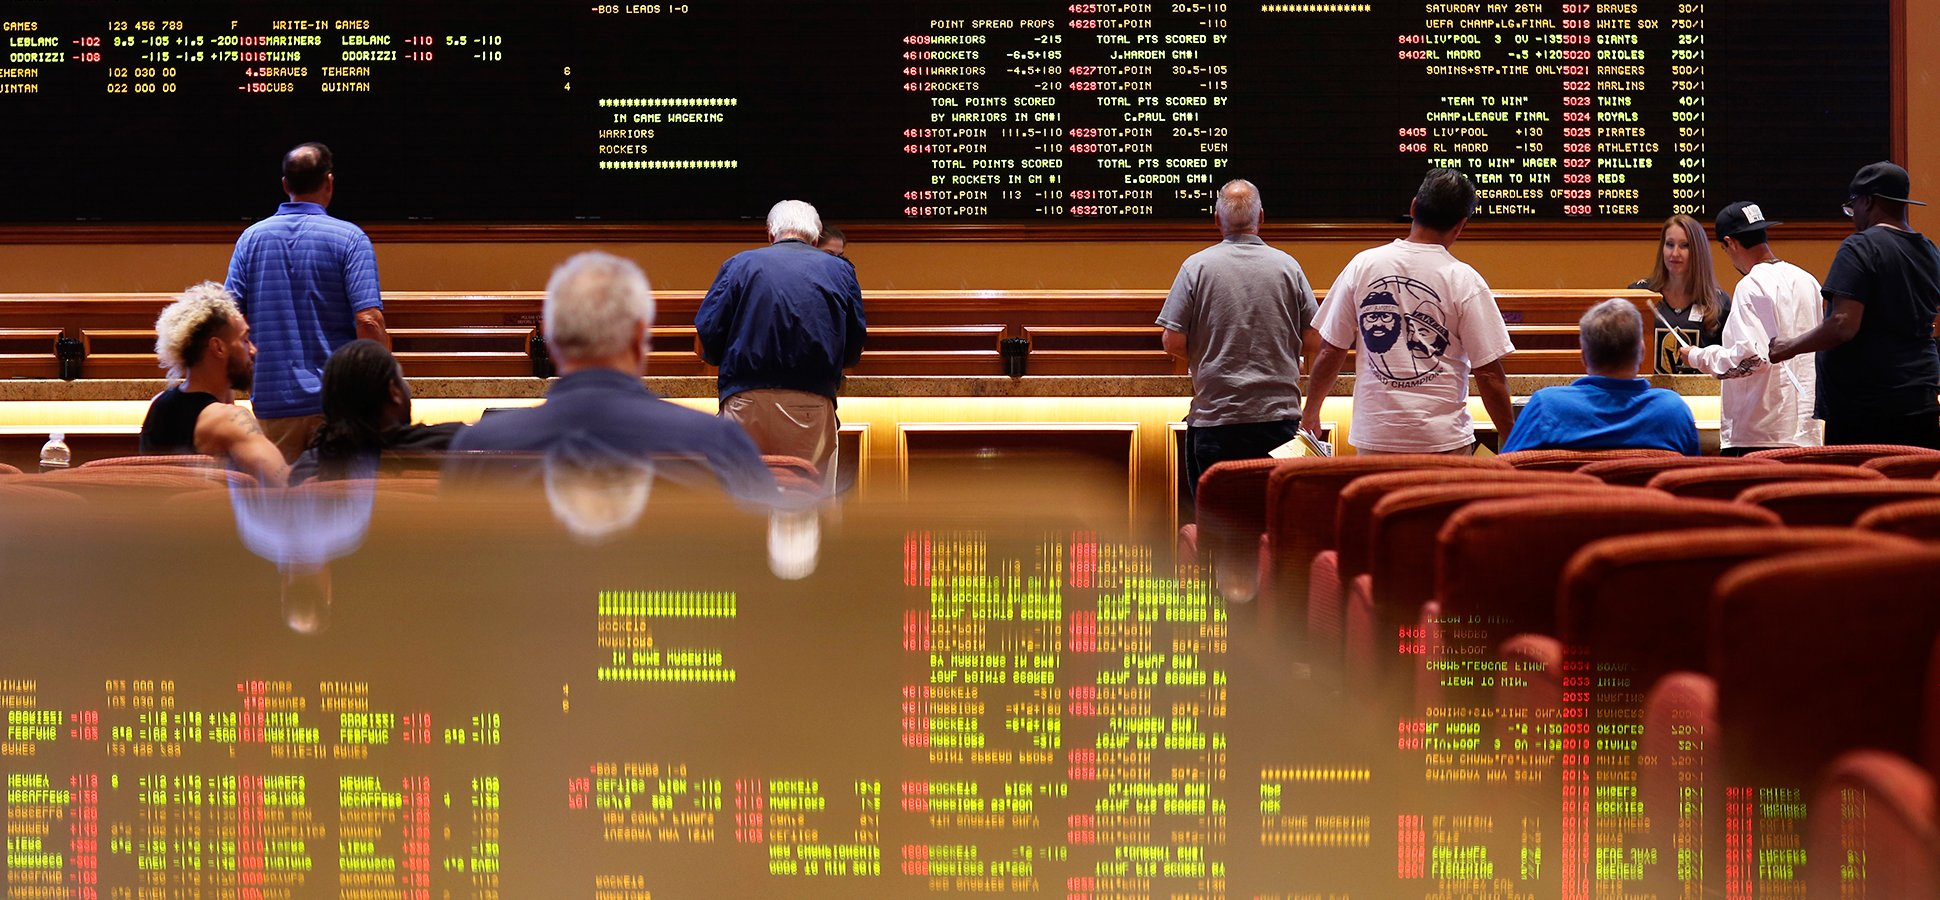 Is online sports gambling legal in california borgata bar poker open blog